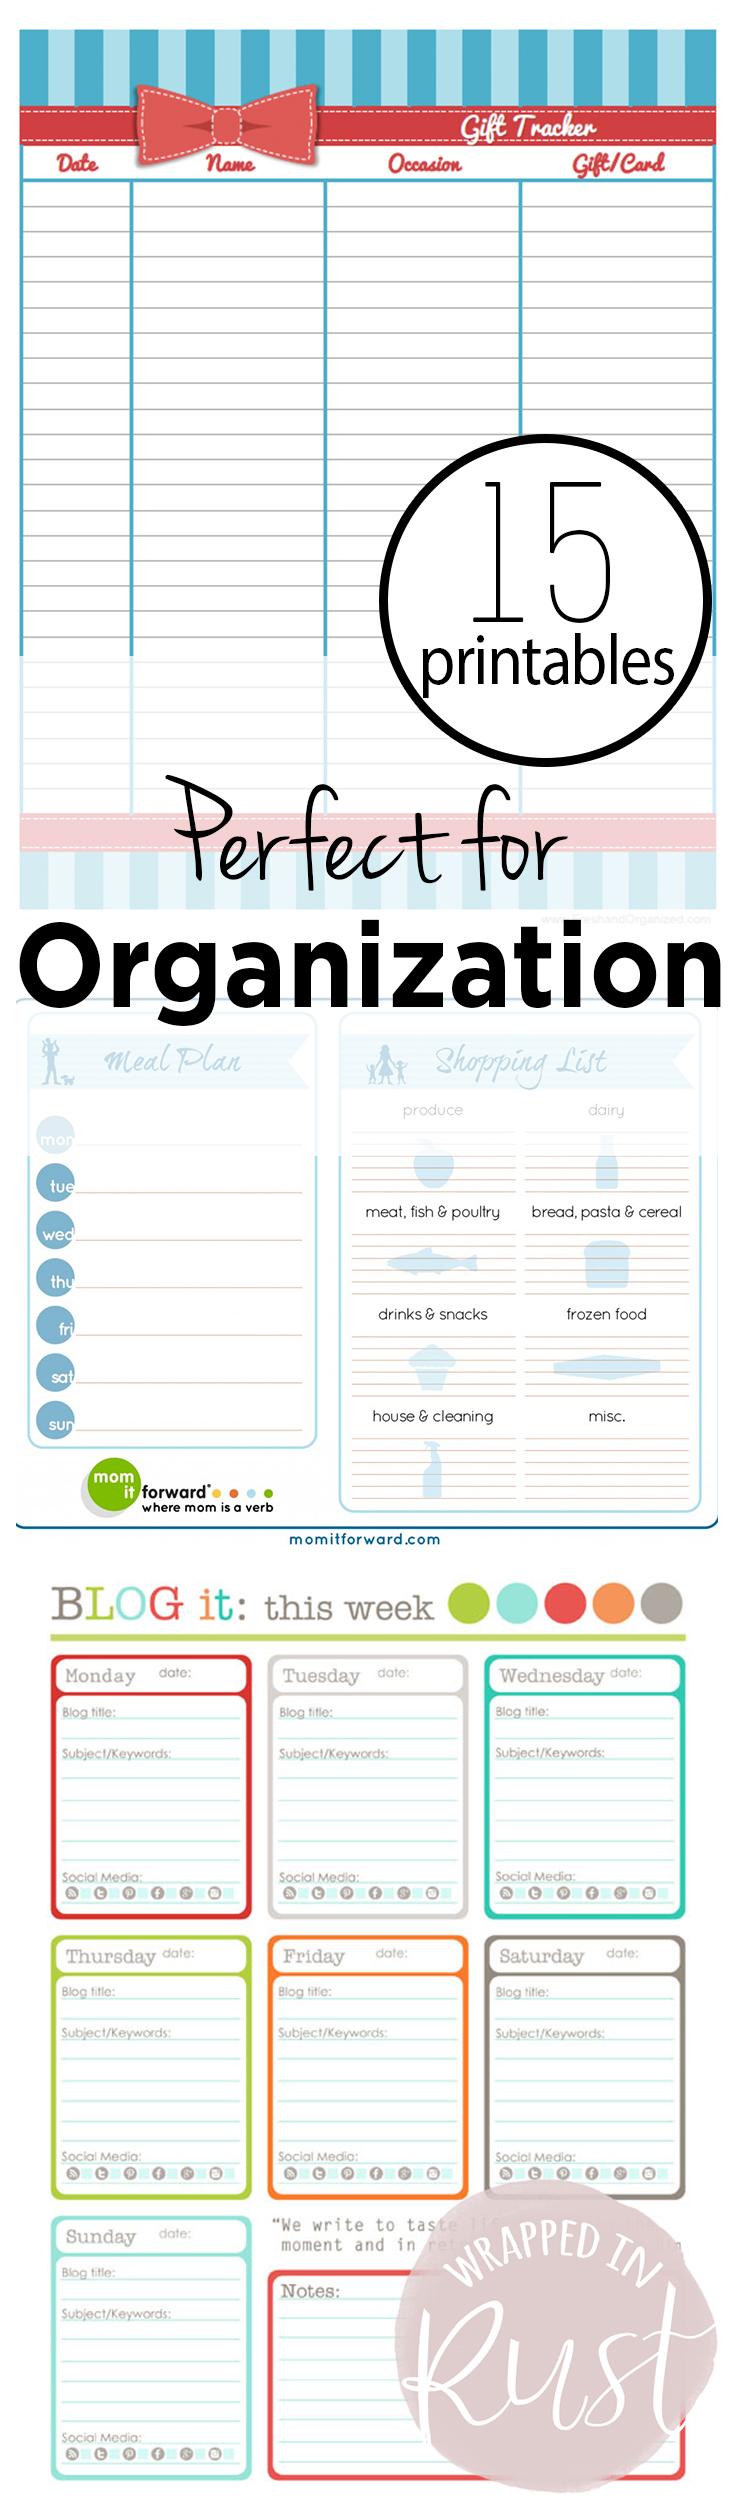 Organization, Organization Printables, Printables for Organization, Organization 101, Free Printables, Cheap Printables, Organization Ideas for Less, Home Organization Ideas, Home Organization Tips and Tricks, Popular Pin